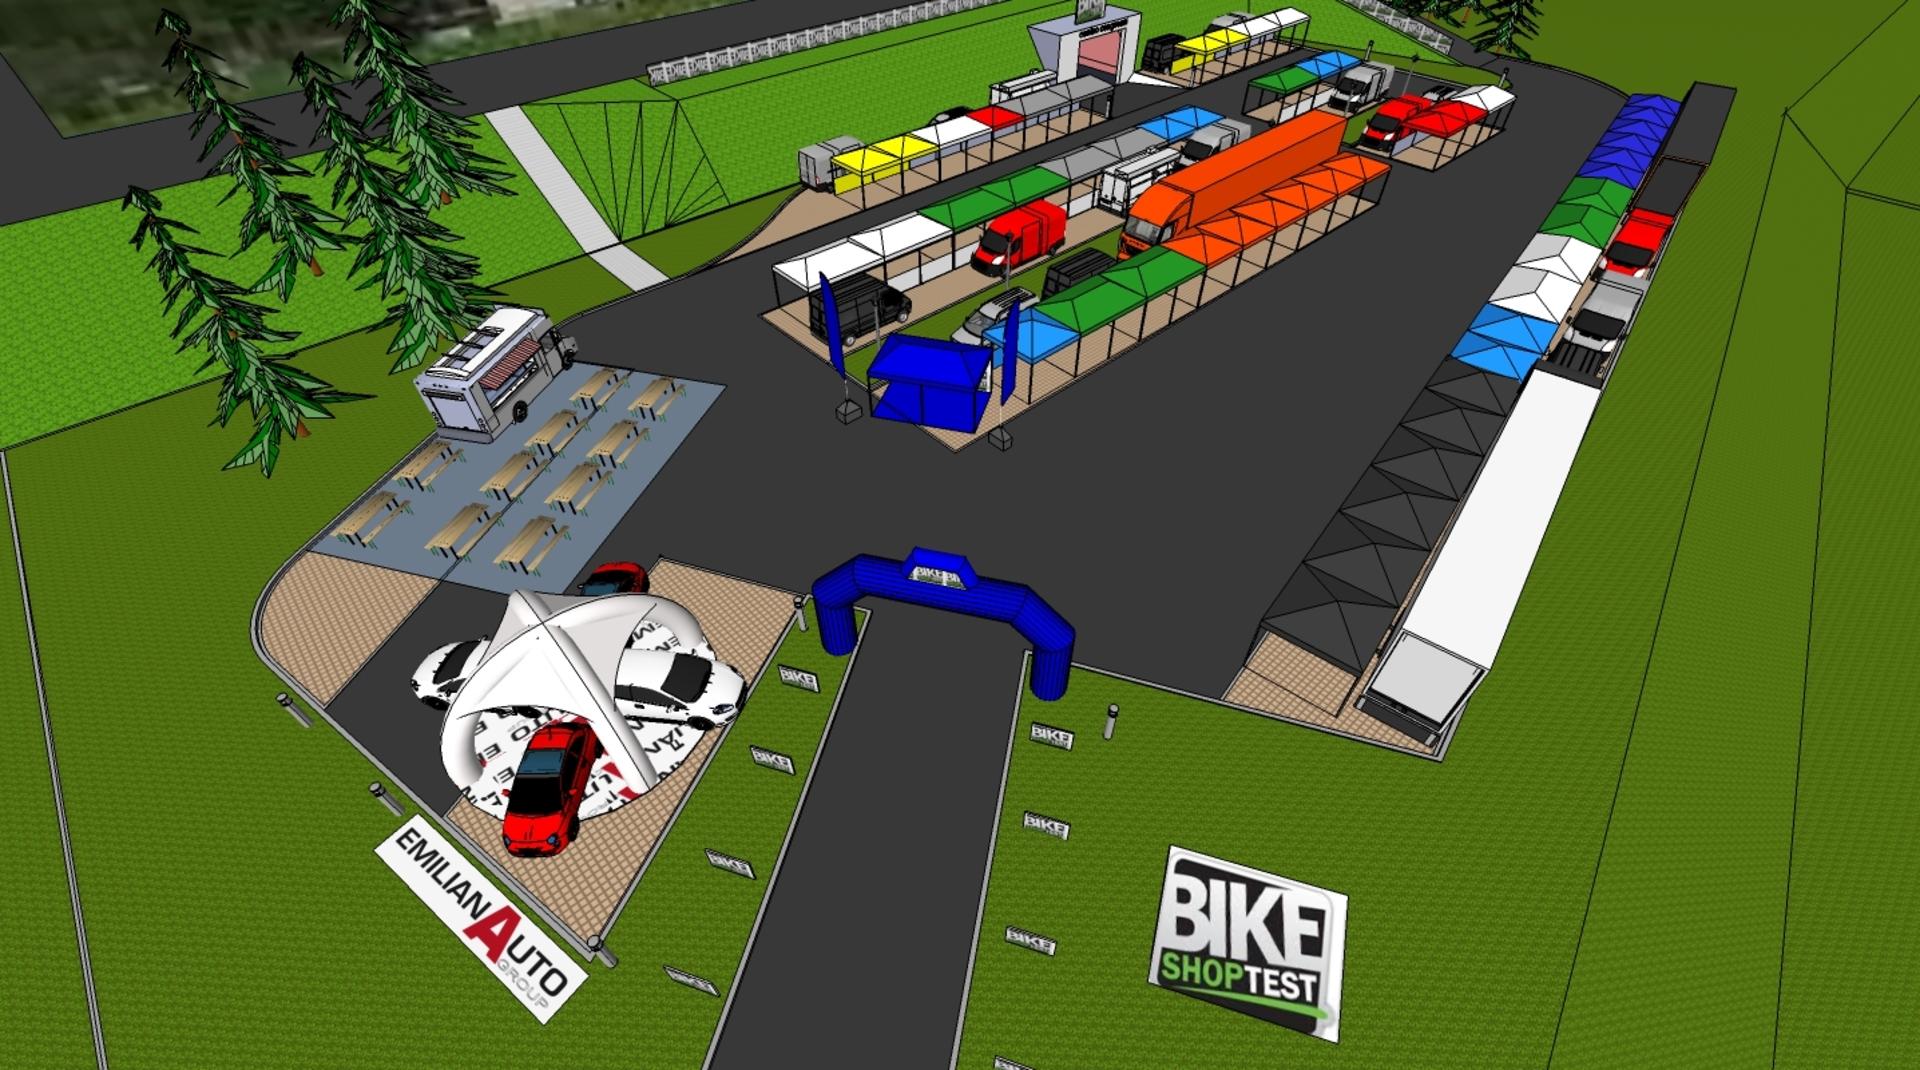 96e7d2d089 Bike Shop Test 2015 a Zola Predosa - 4ActionSport